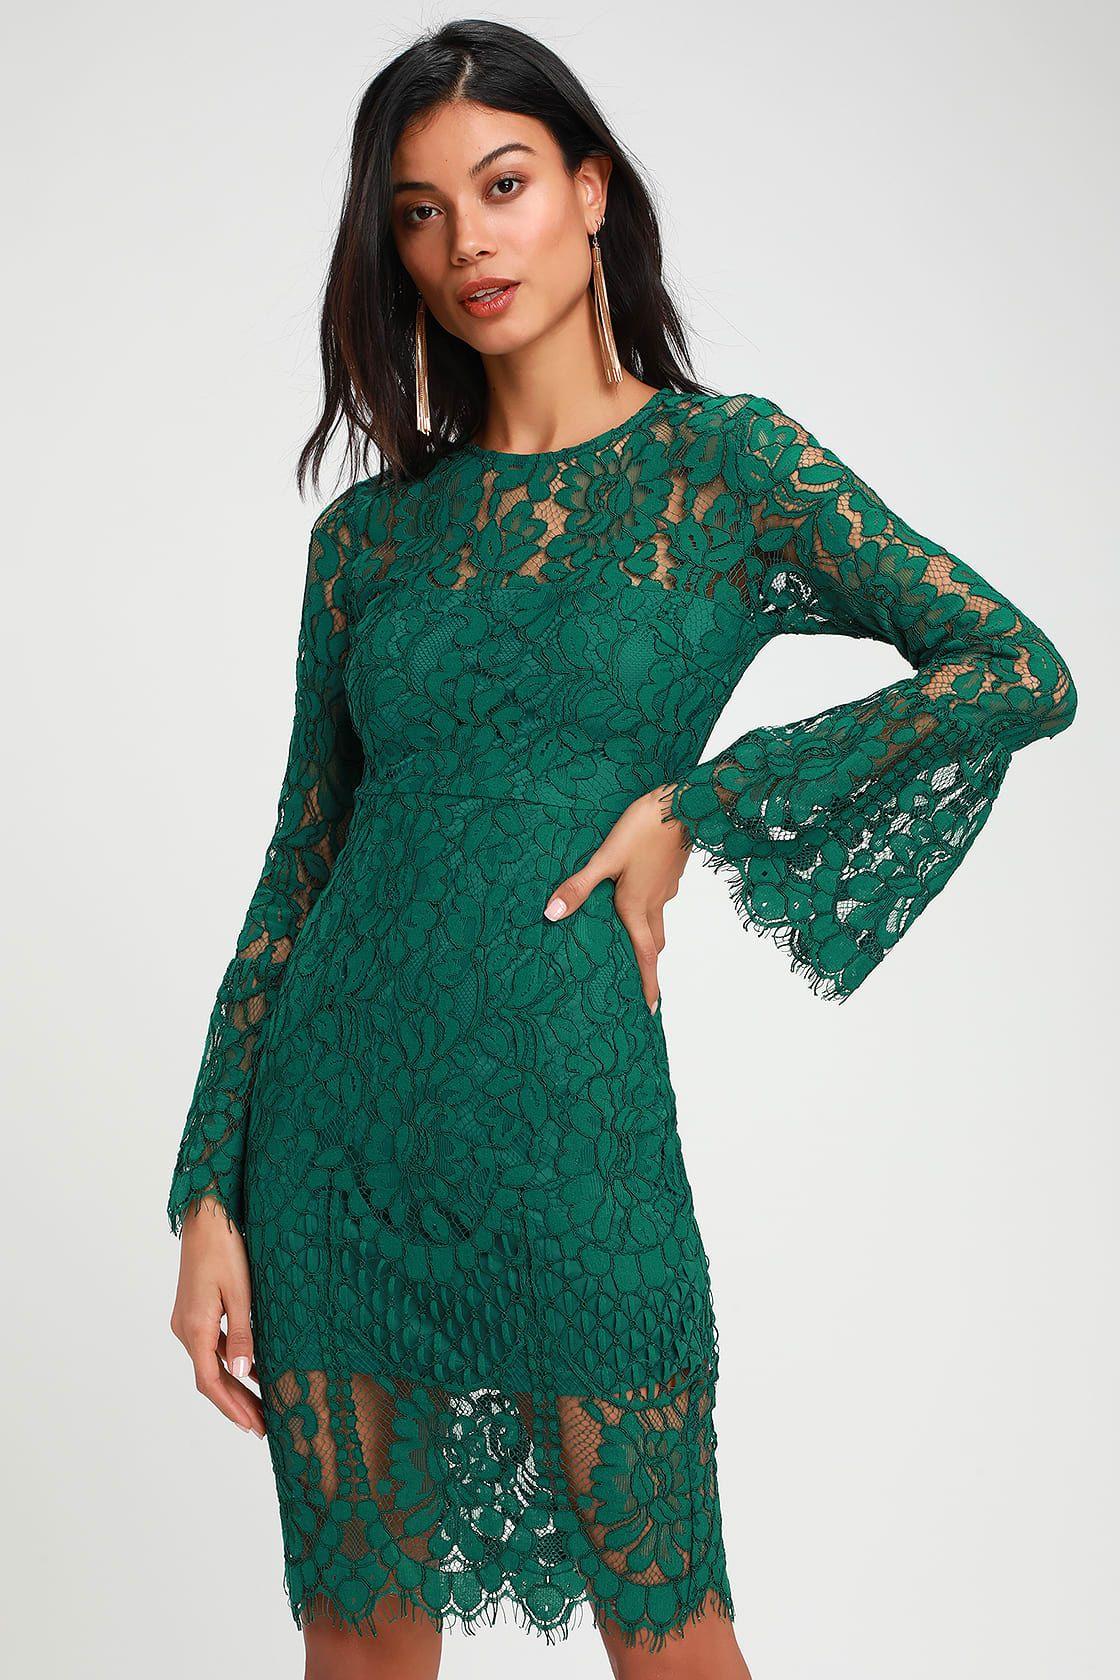 bdbf6995fcbb3 Enrapturing Elegance Green Lace Long Sleeve Midi Dress in 2019 ...